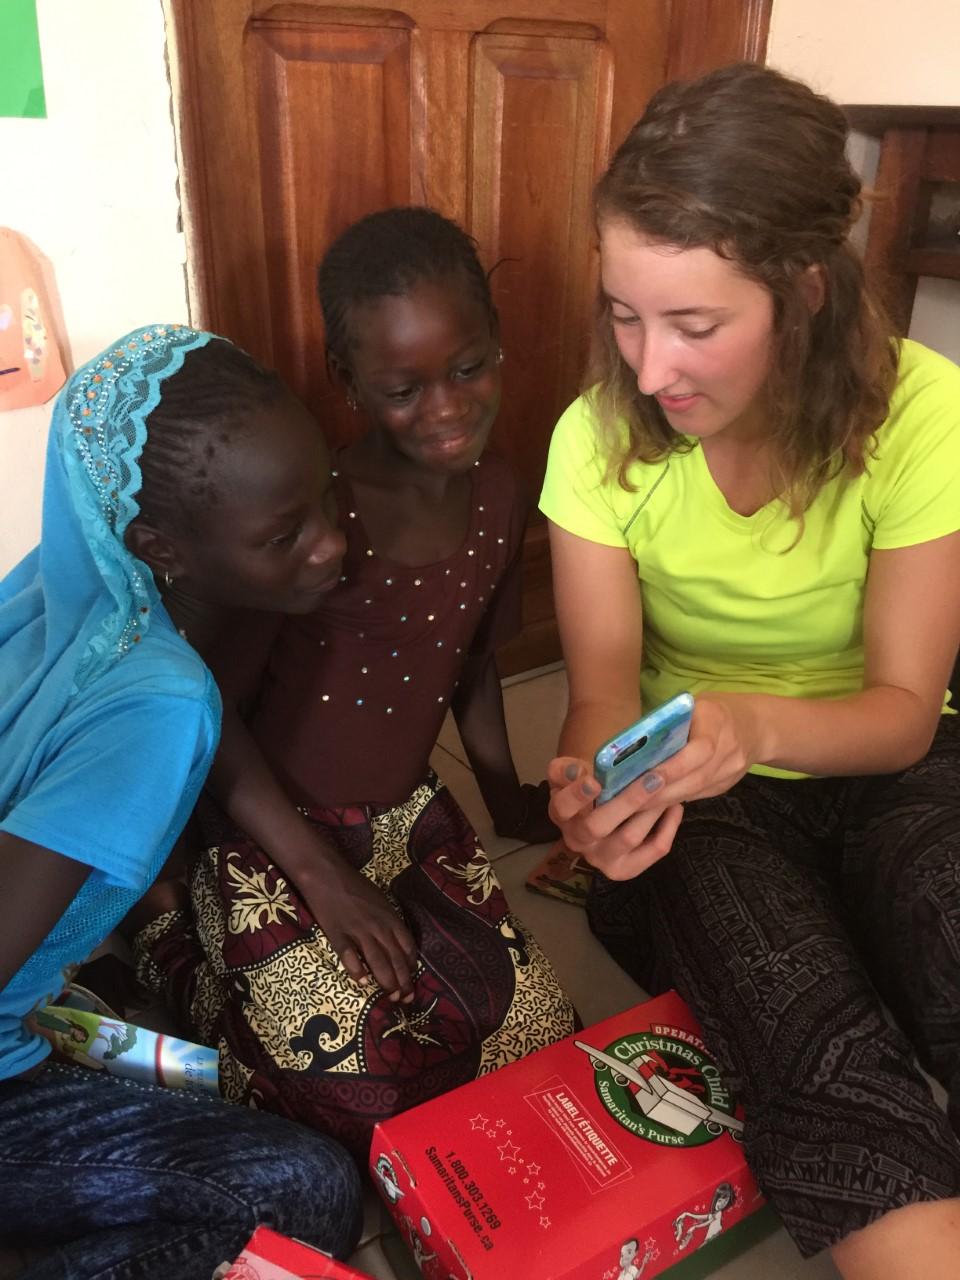 Kaylee handing out shoeboxes in Senegal, Africa.